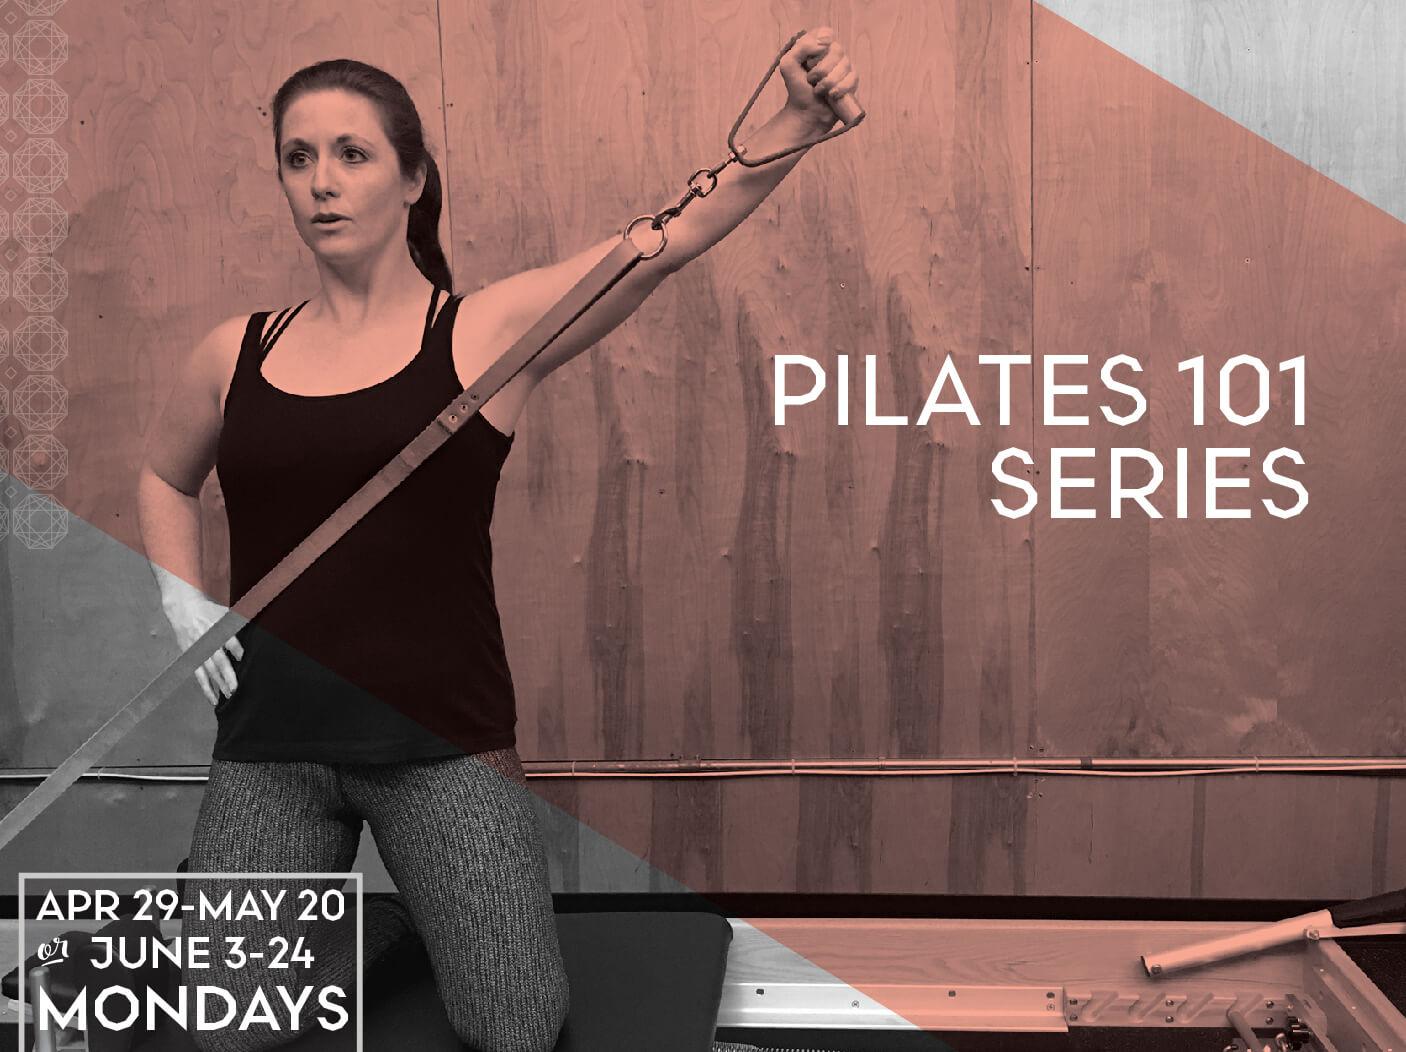 Pilates 101